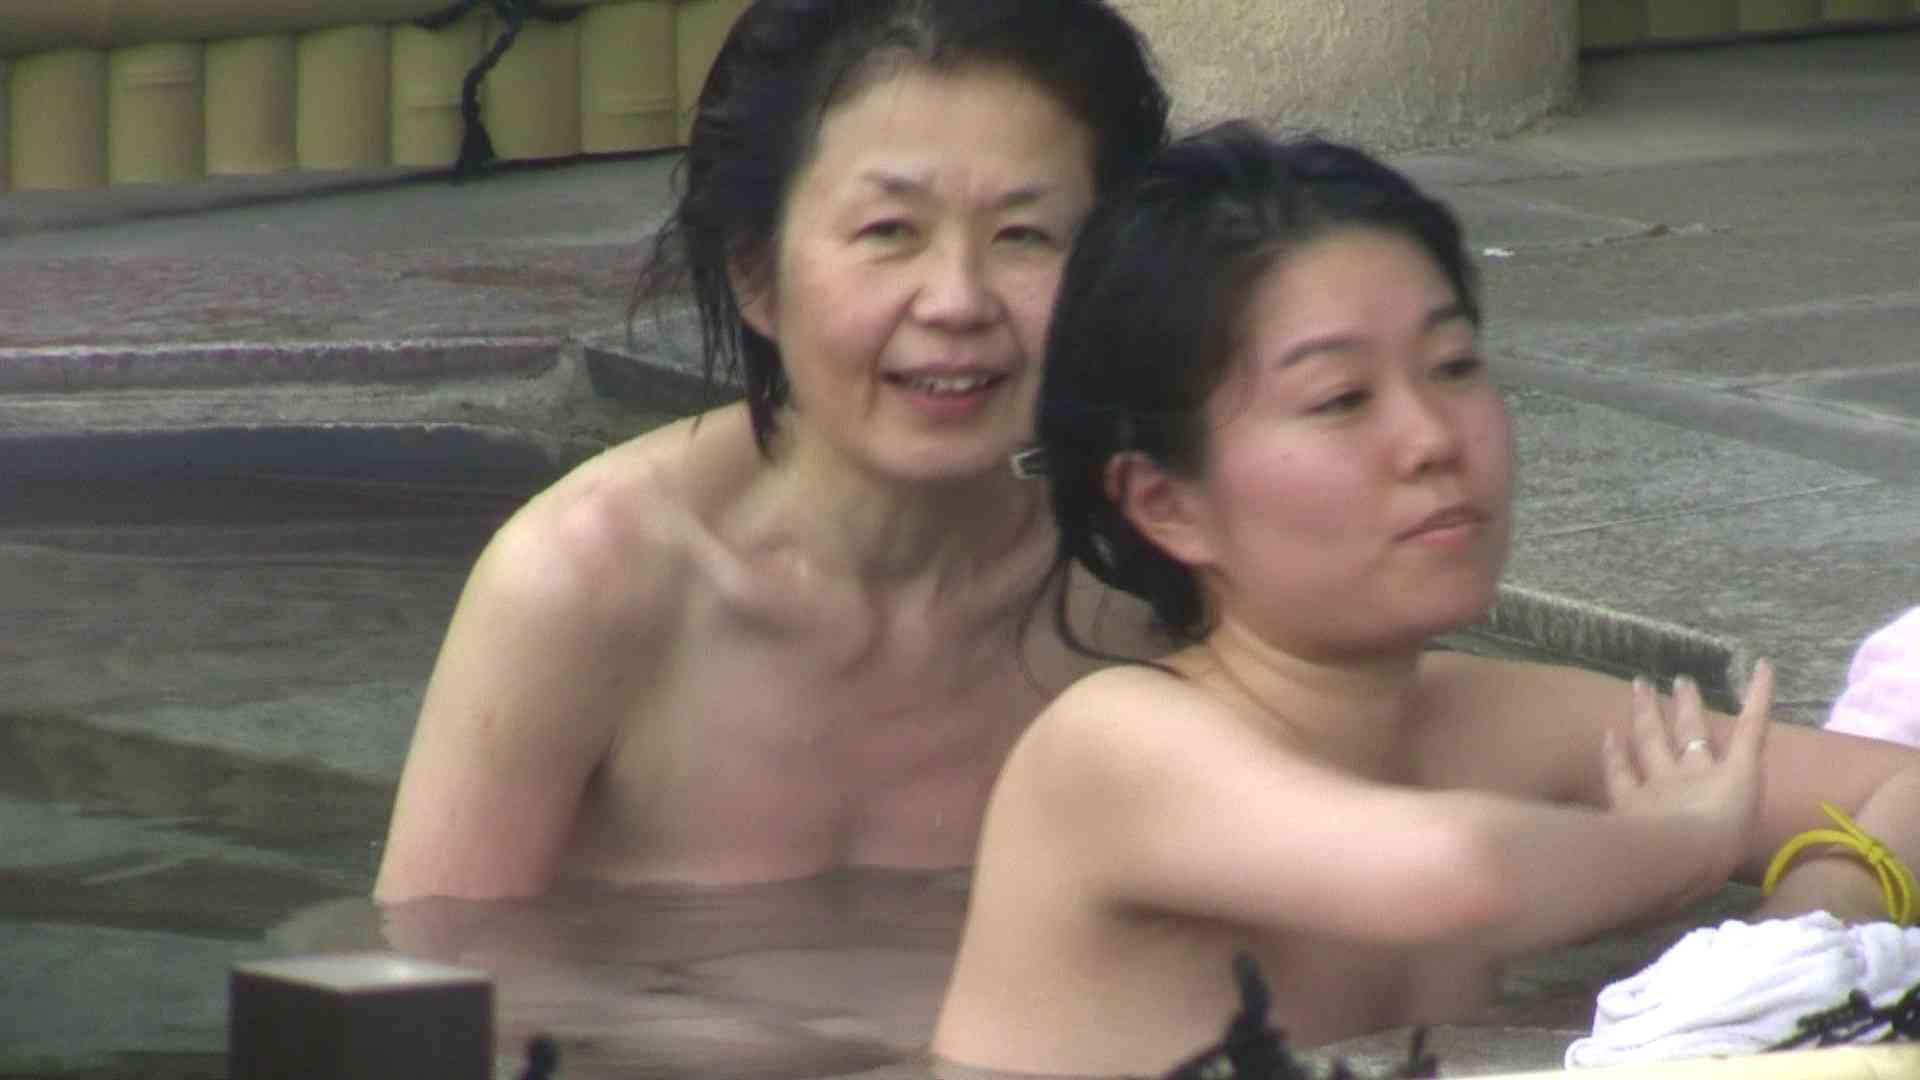 Aquaな露天風呂Vol.675 露天 オマンコ動画キャプチャ 77画像 77